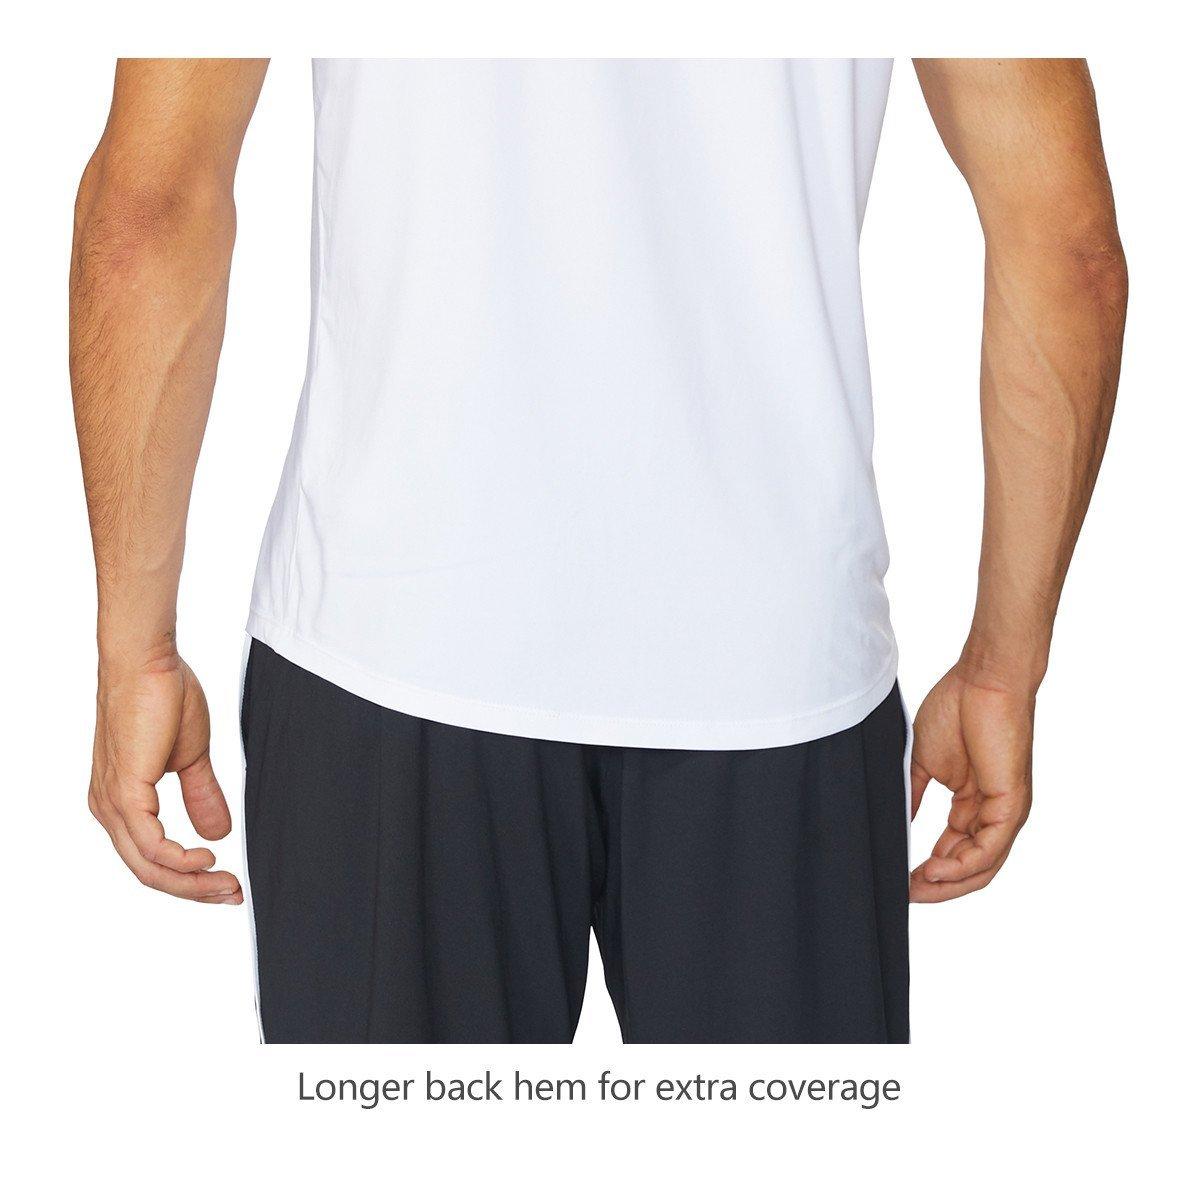 Baleaf Men's Quick Dry Short Sleeve T-Shirt Running Fitness Shirts White Size M by Baleaf (Image #6)